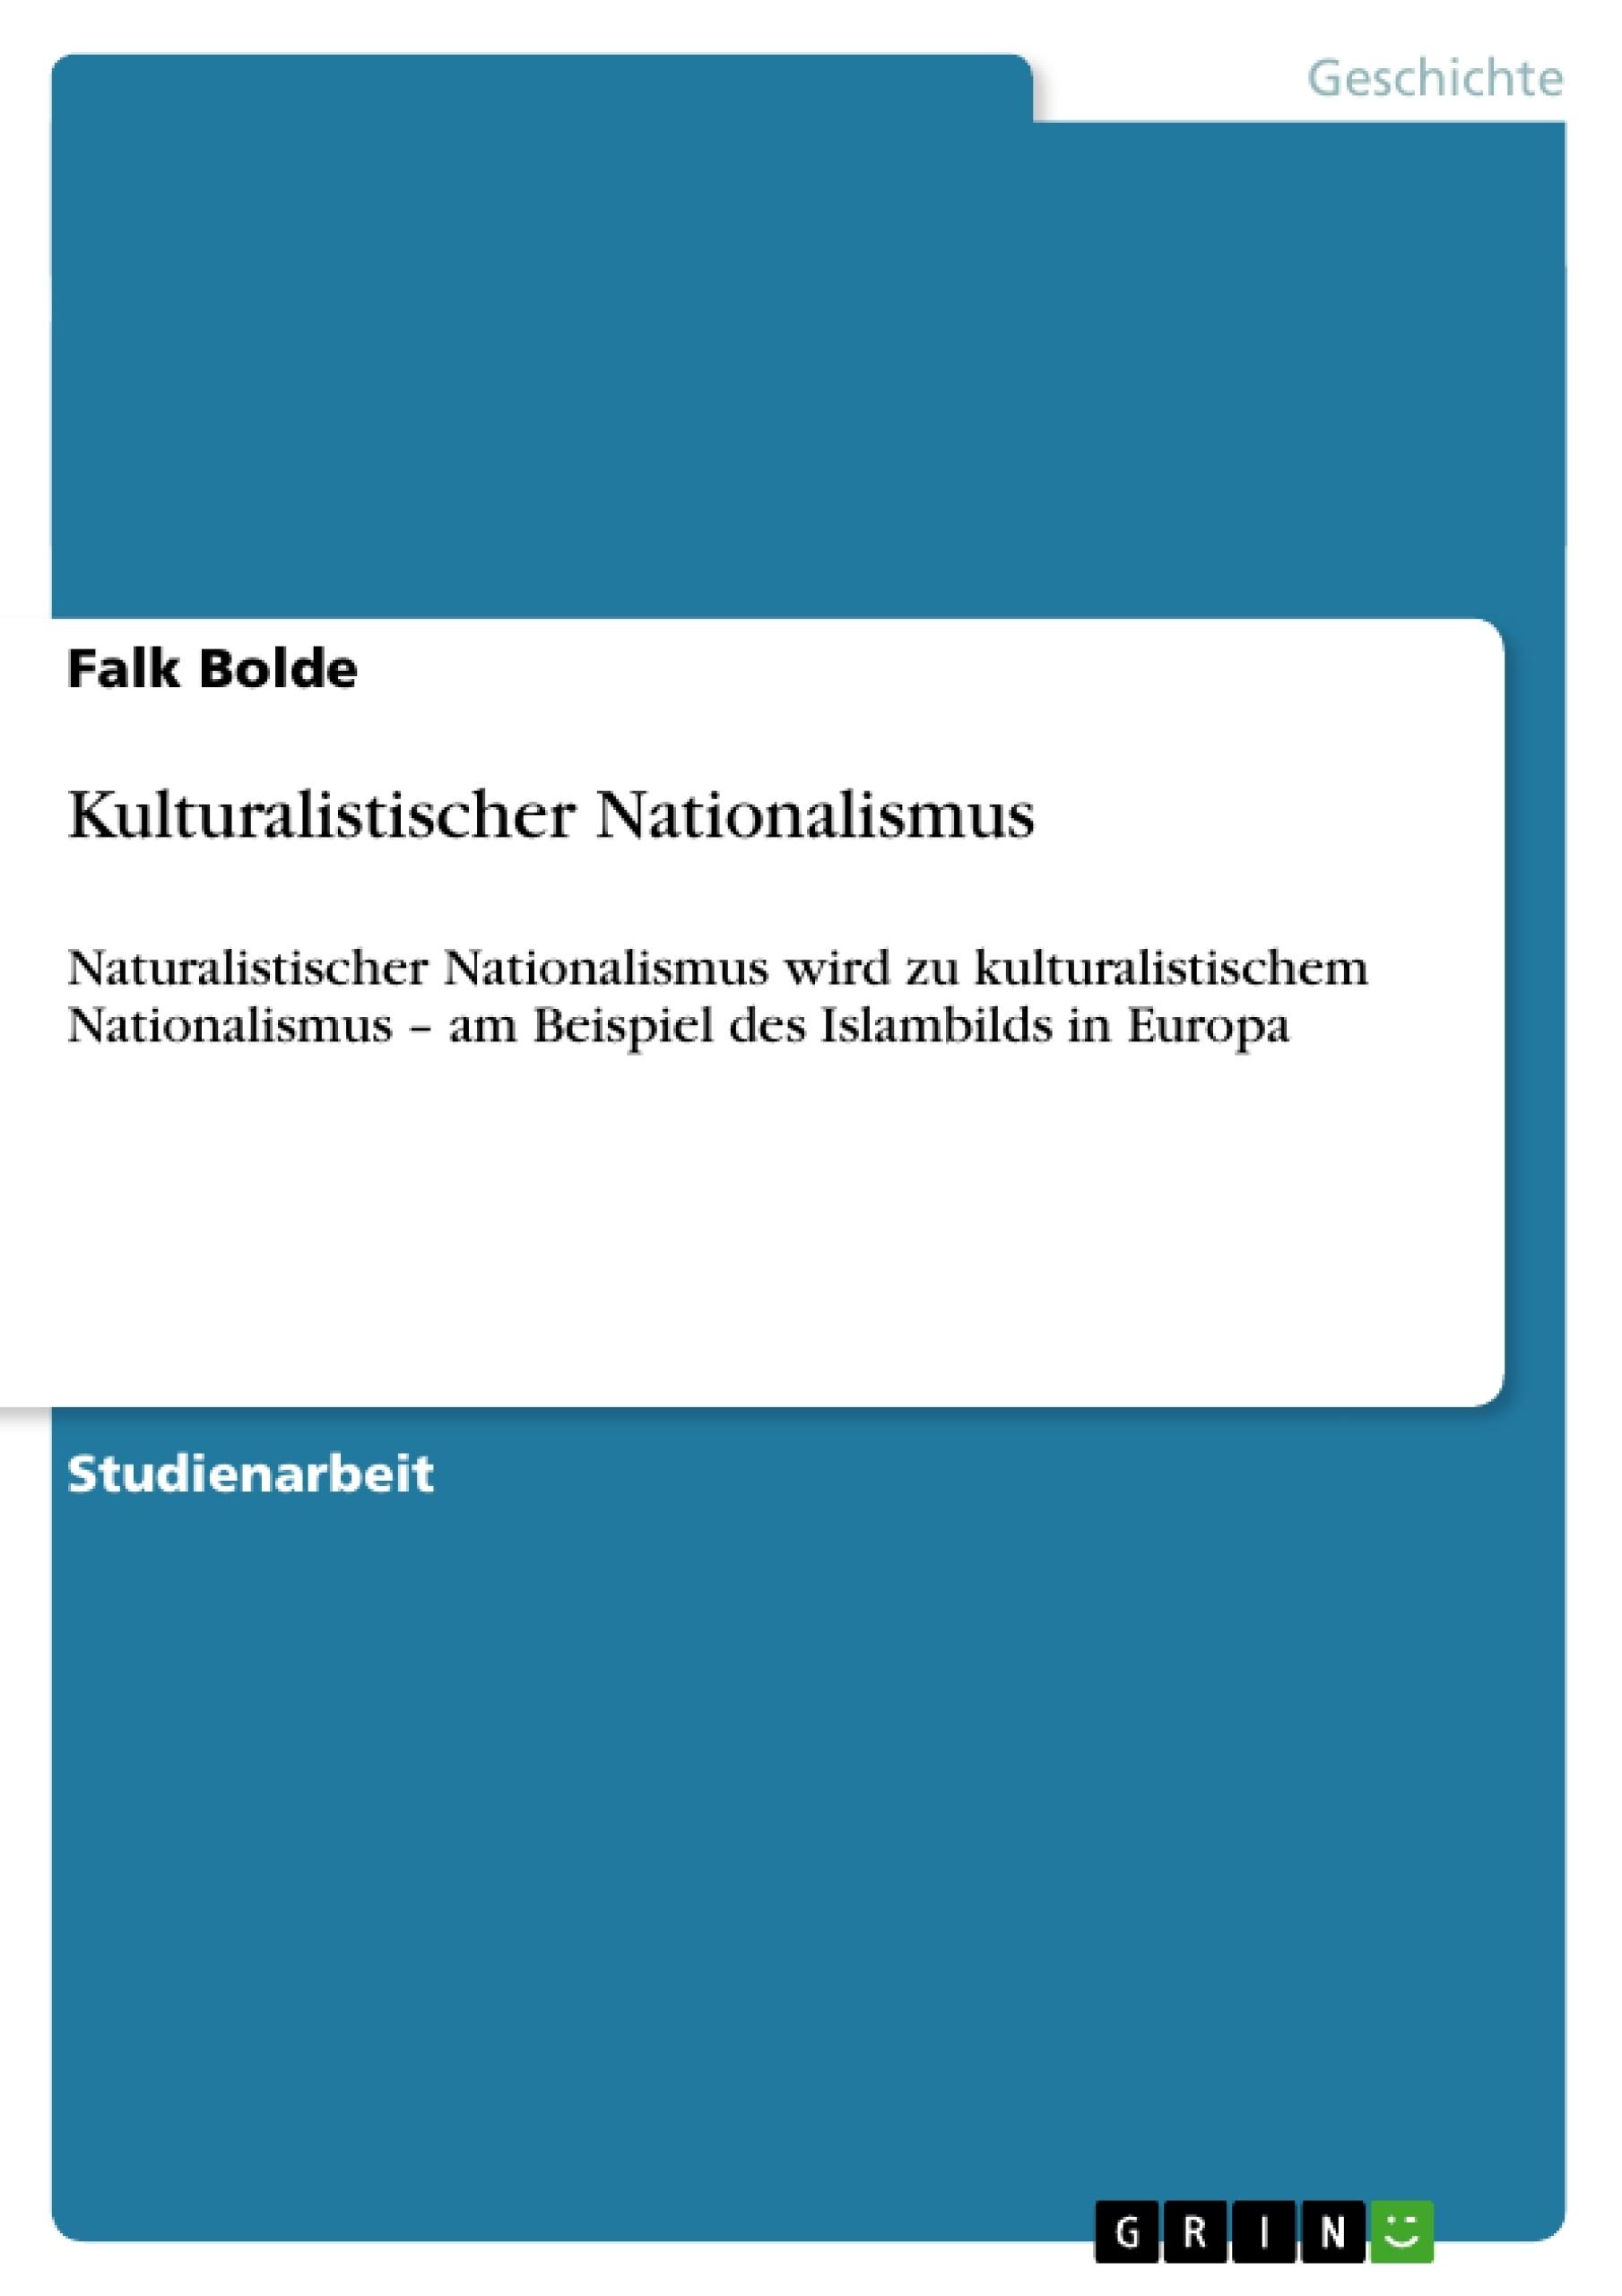 Titel: Kulturalistischer Nationalismus